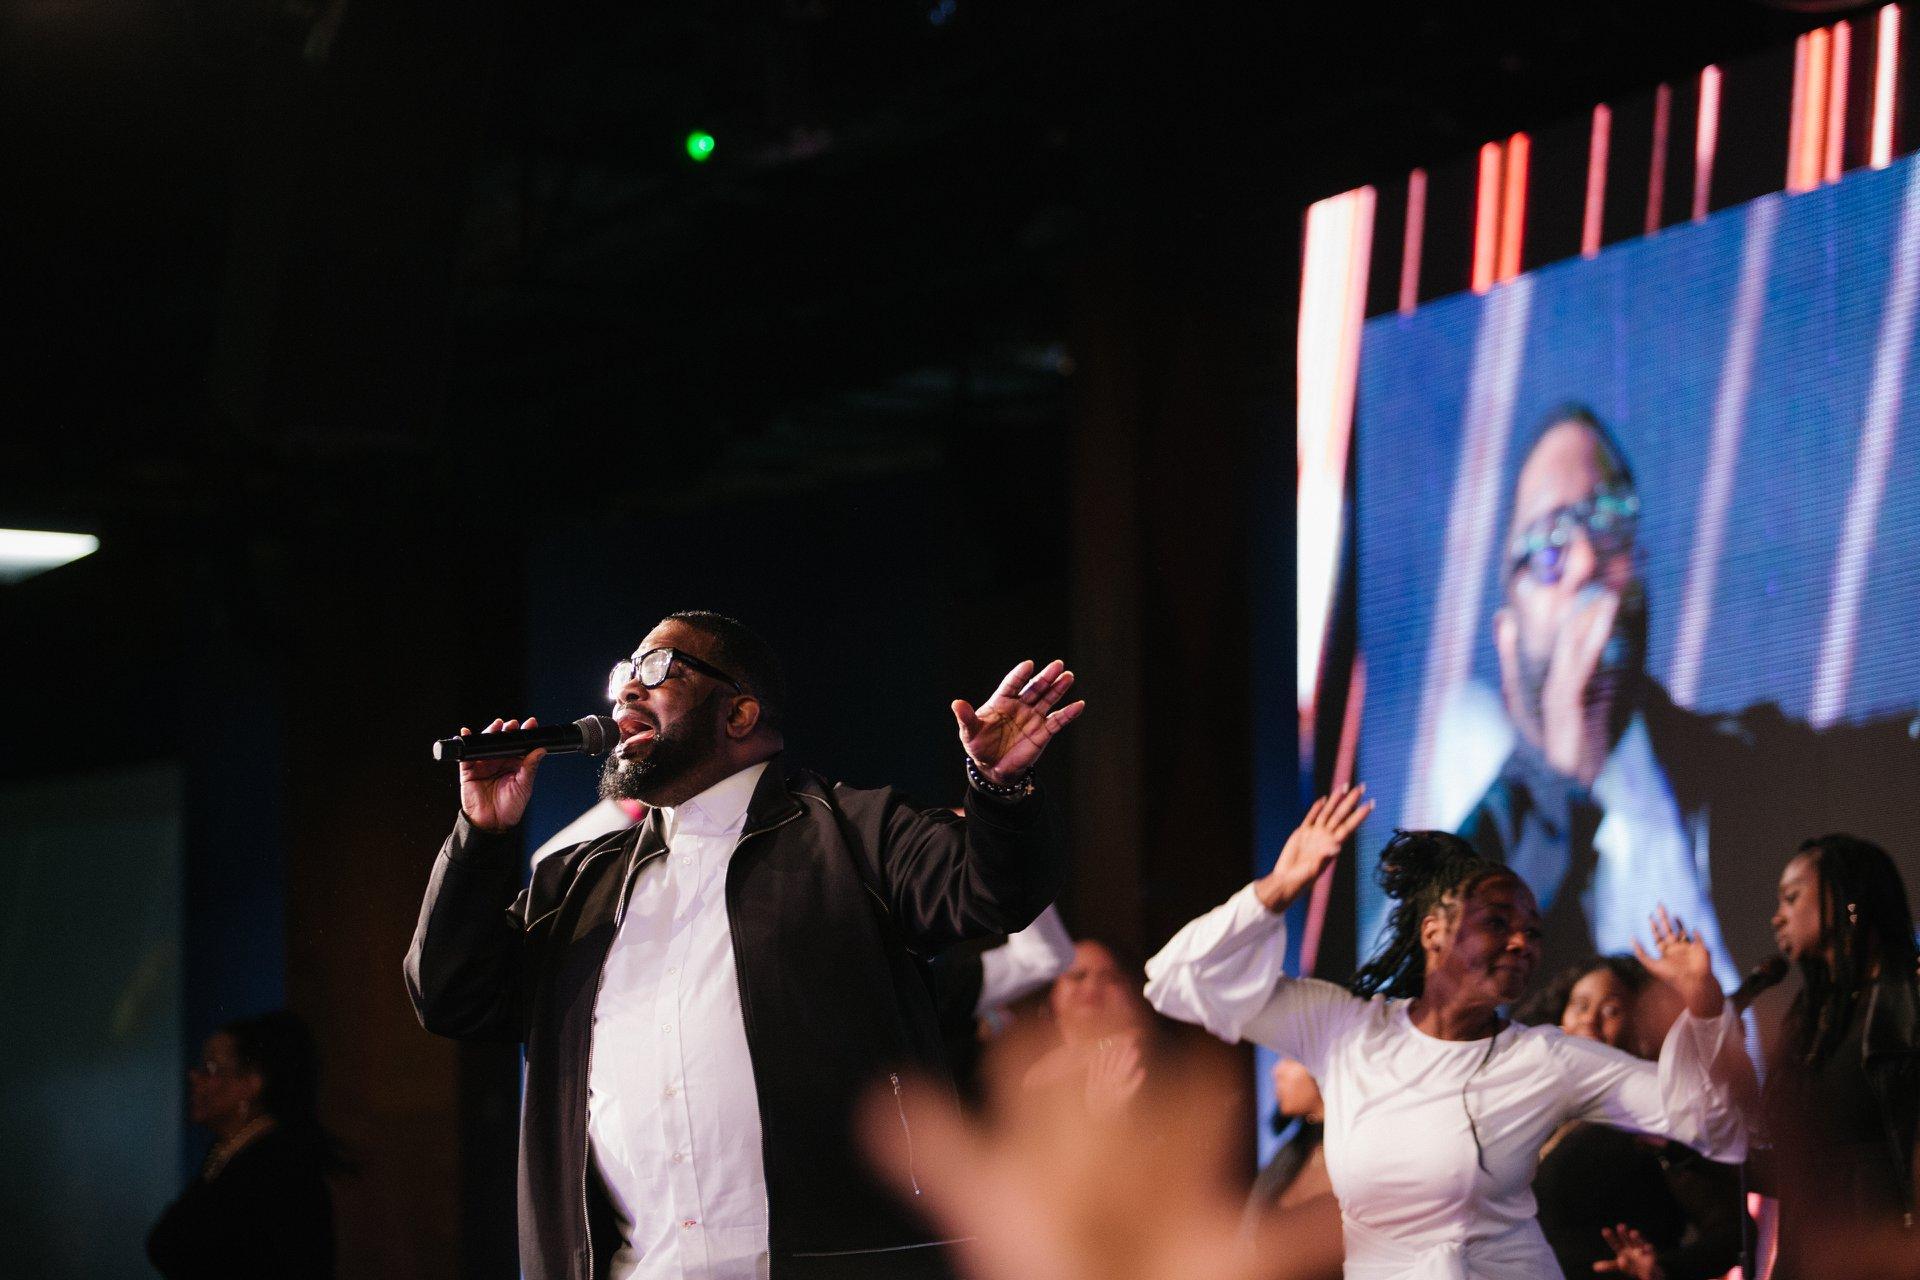 Bishop Hezekiah Walker gave a powerful closer.